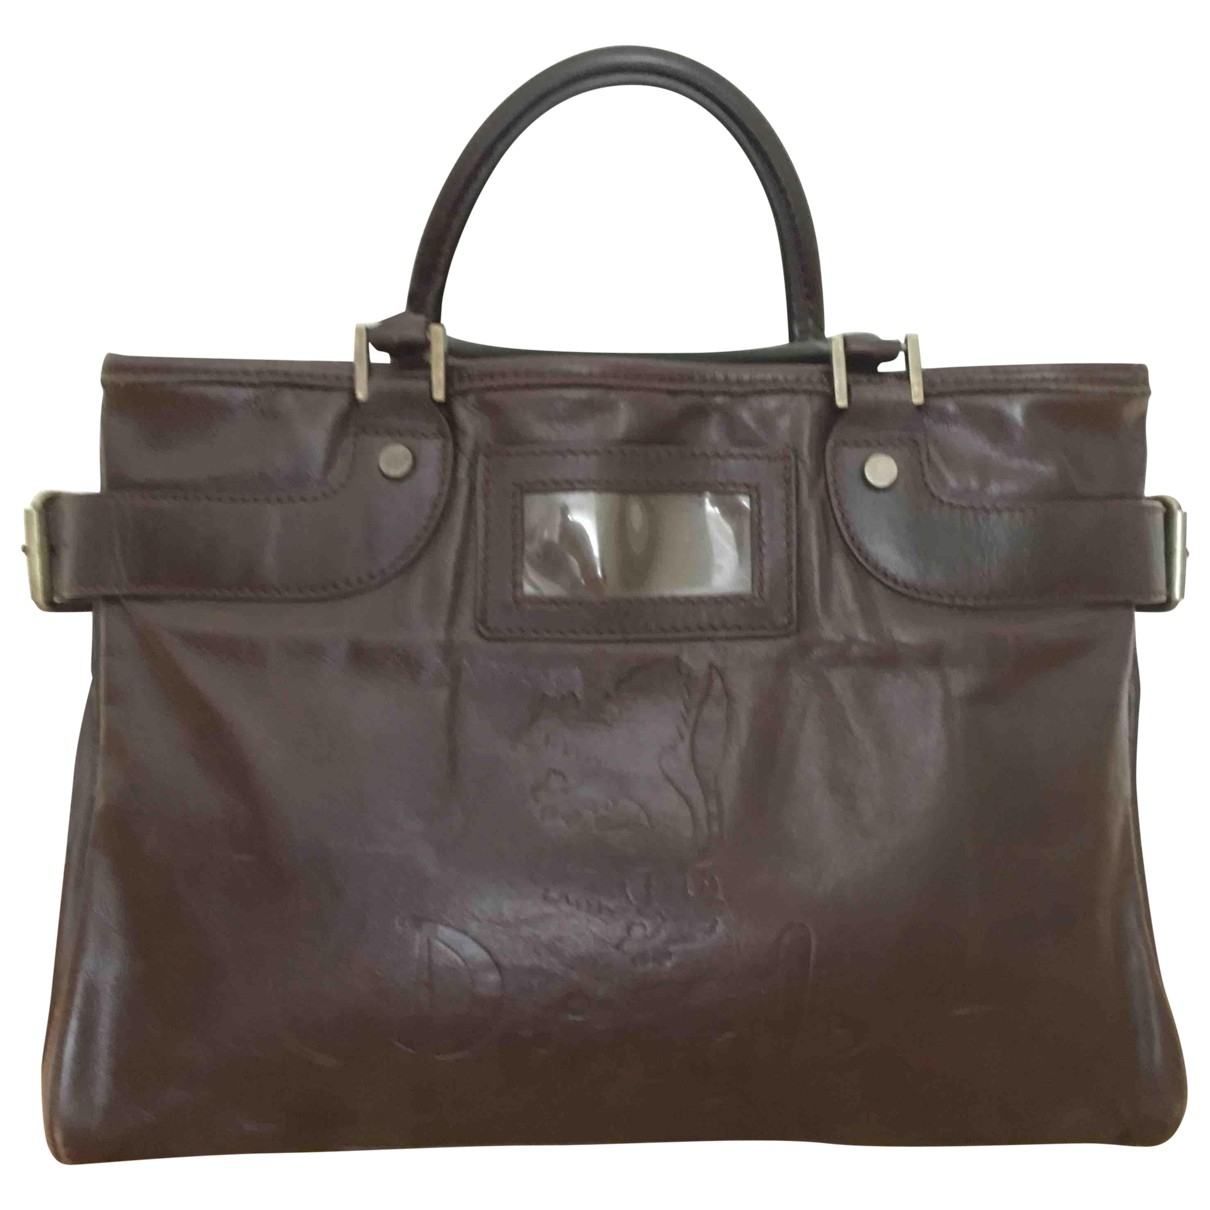 Pringle Of Scotland \N Brown Leather handbag for Women \N